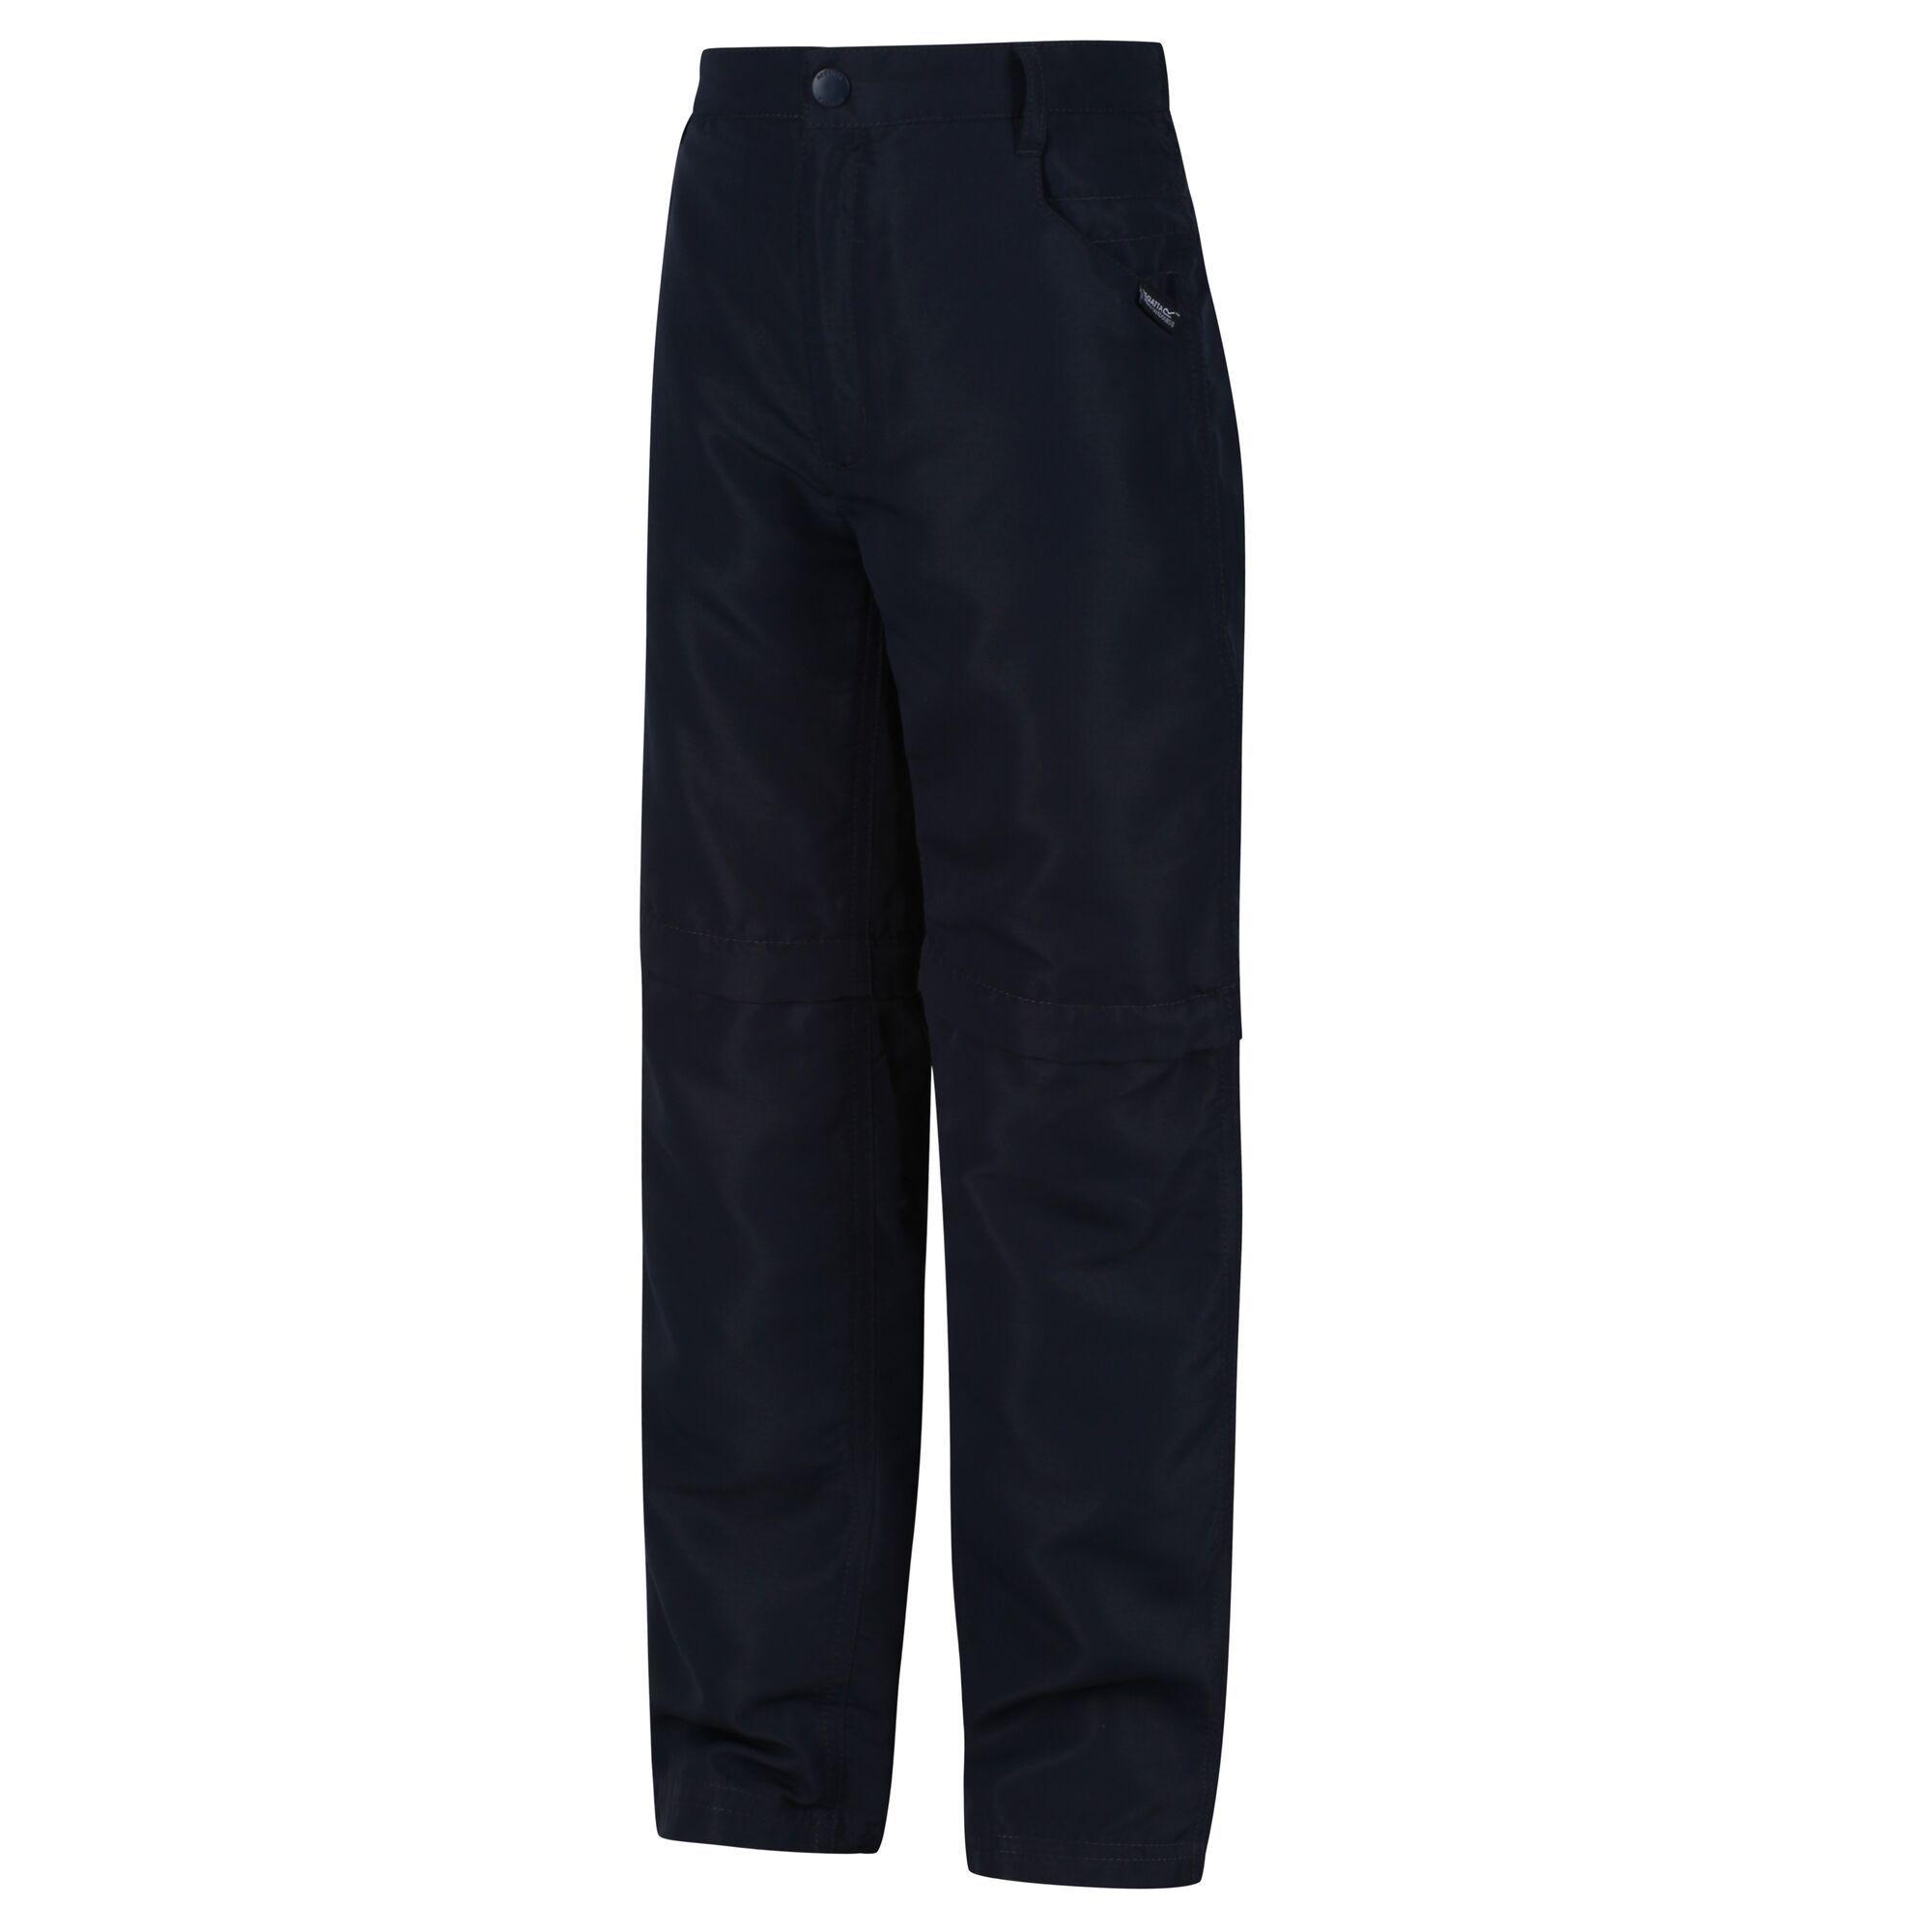 Regatta Childrens/Kids Sorcer II Zip Off Trousers